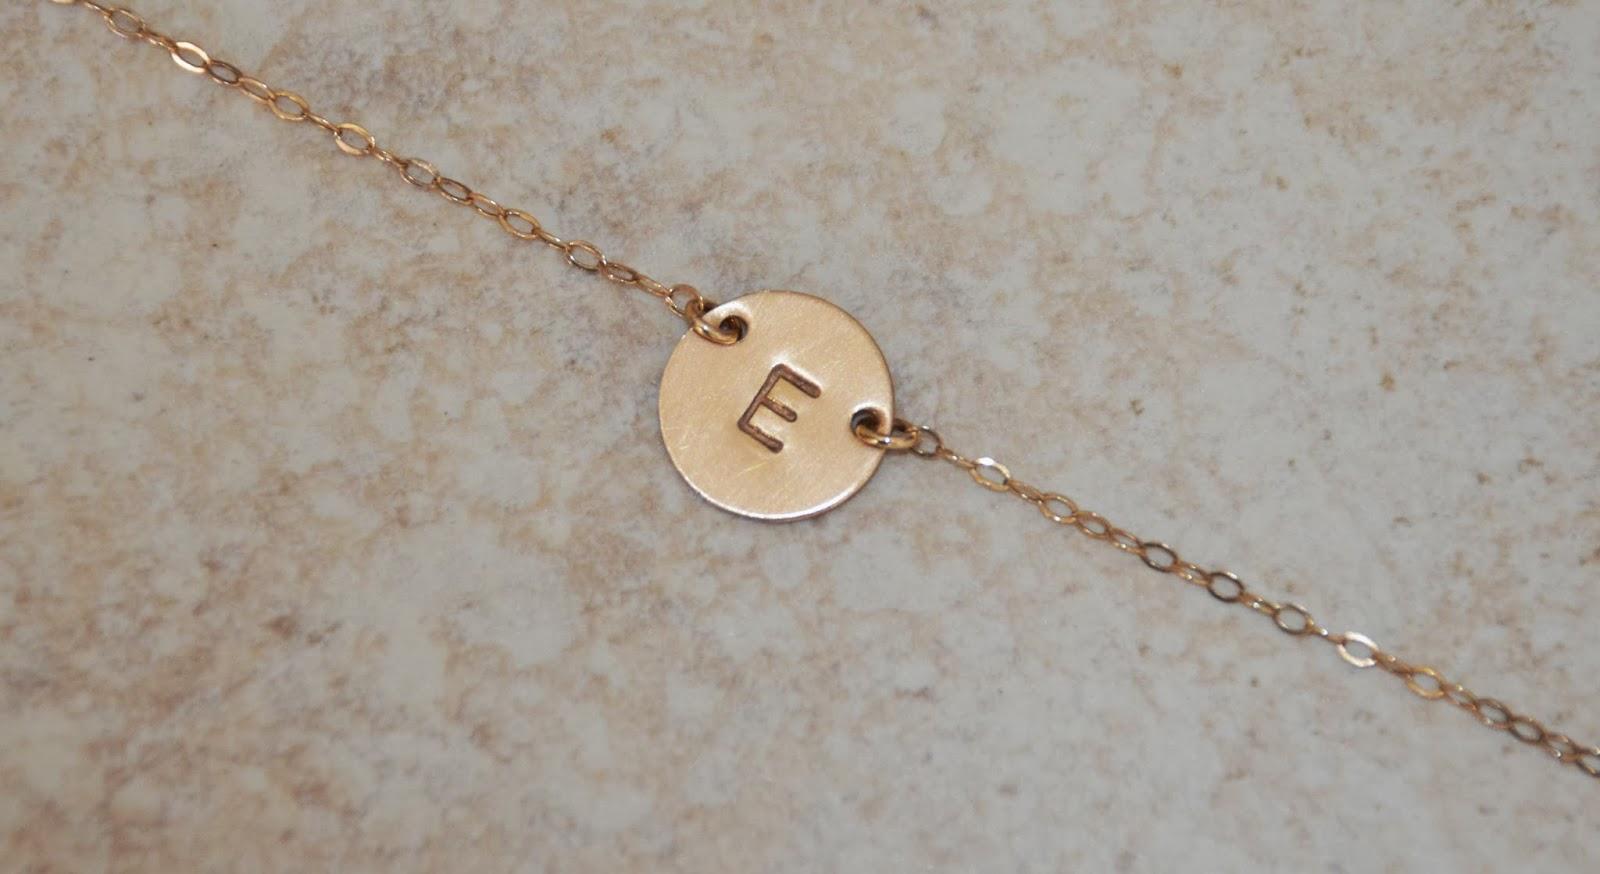 jlm : Friday Favorite: Personalized Jewelry